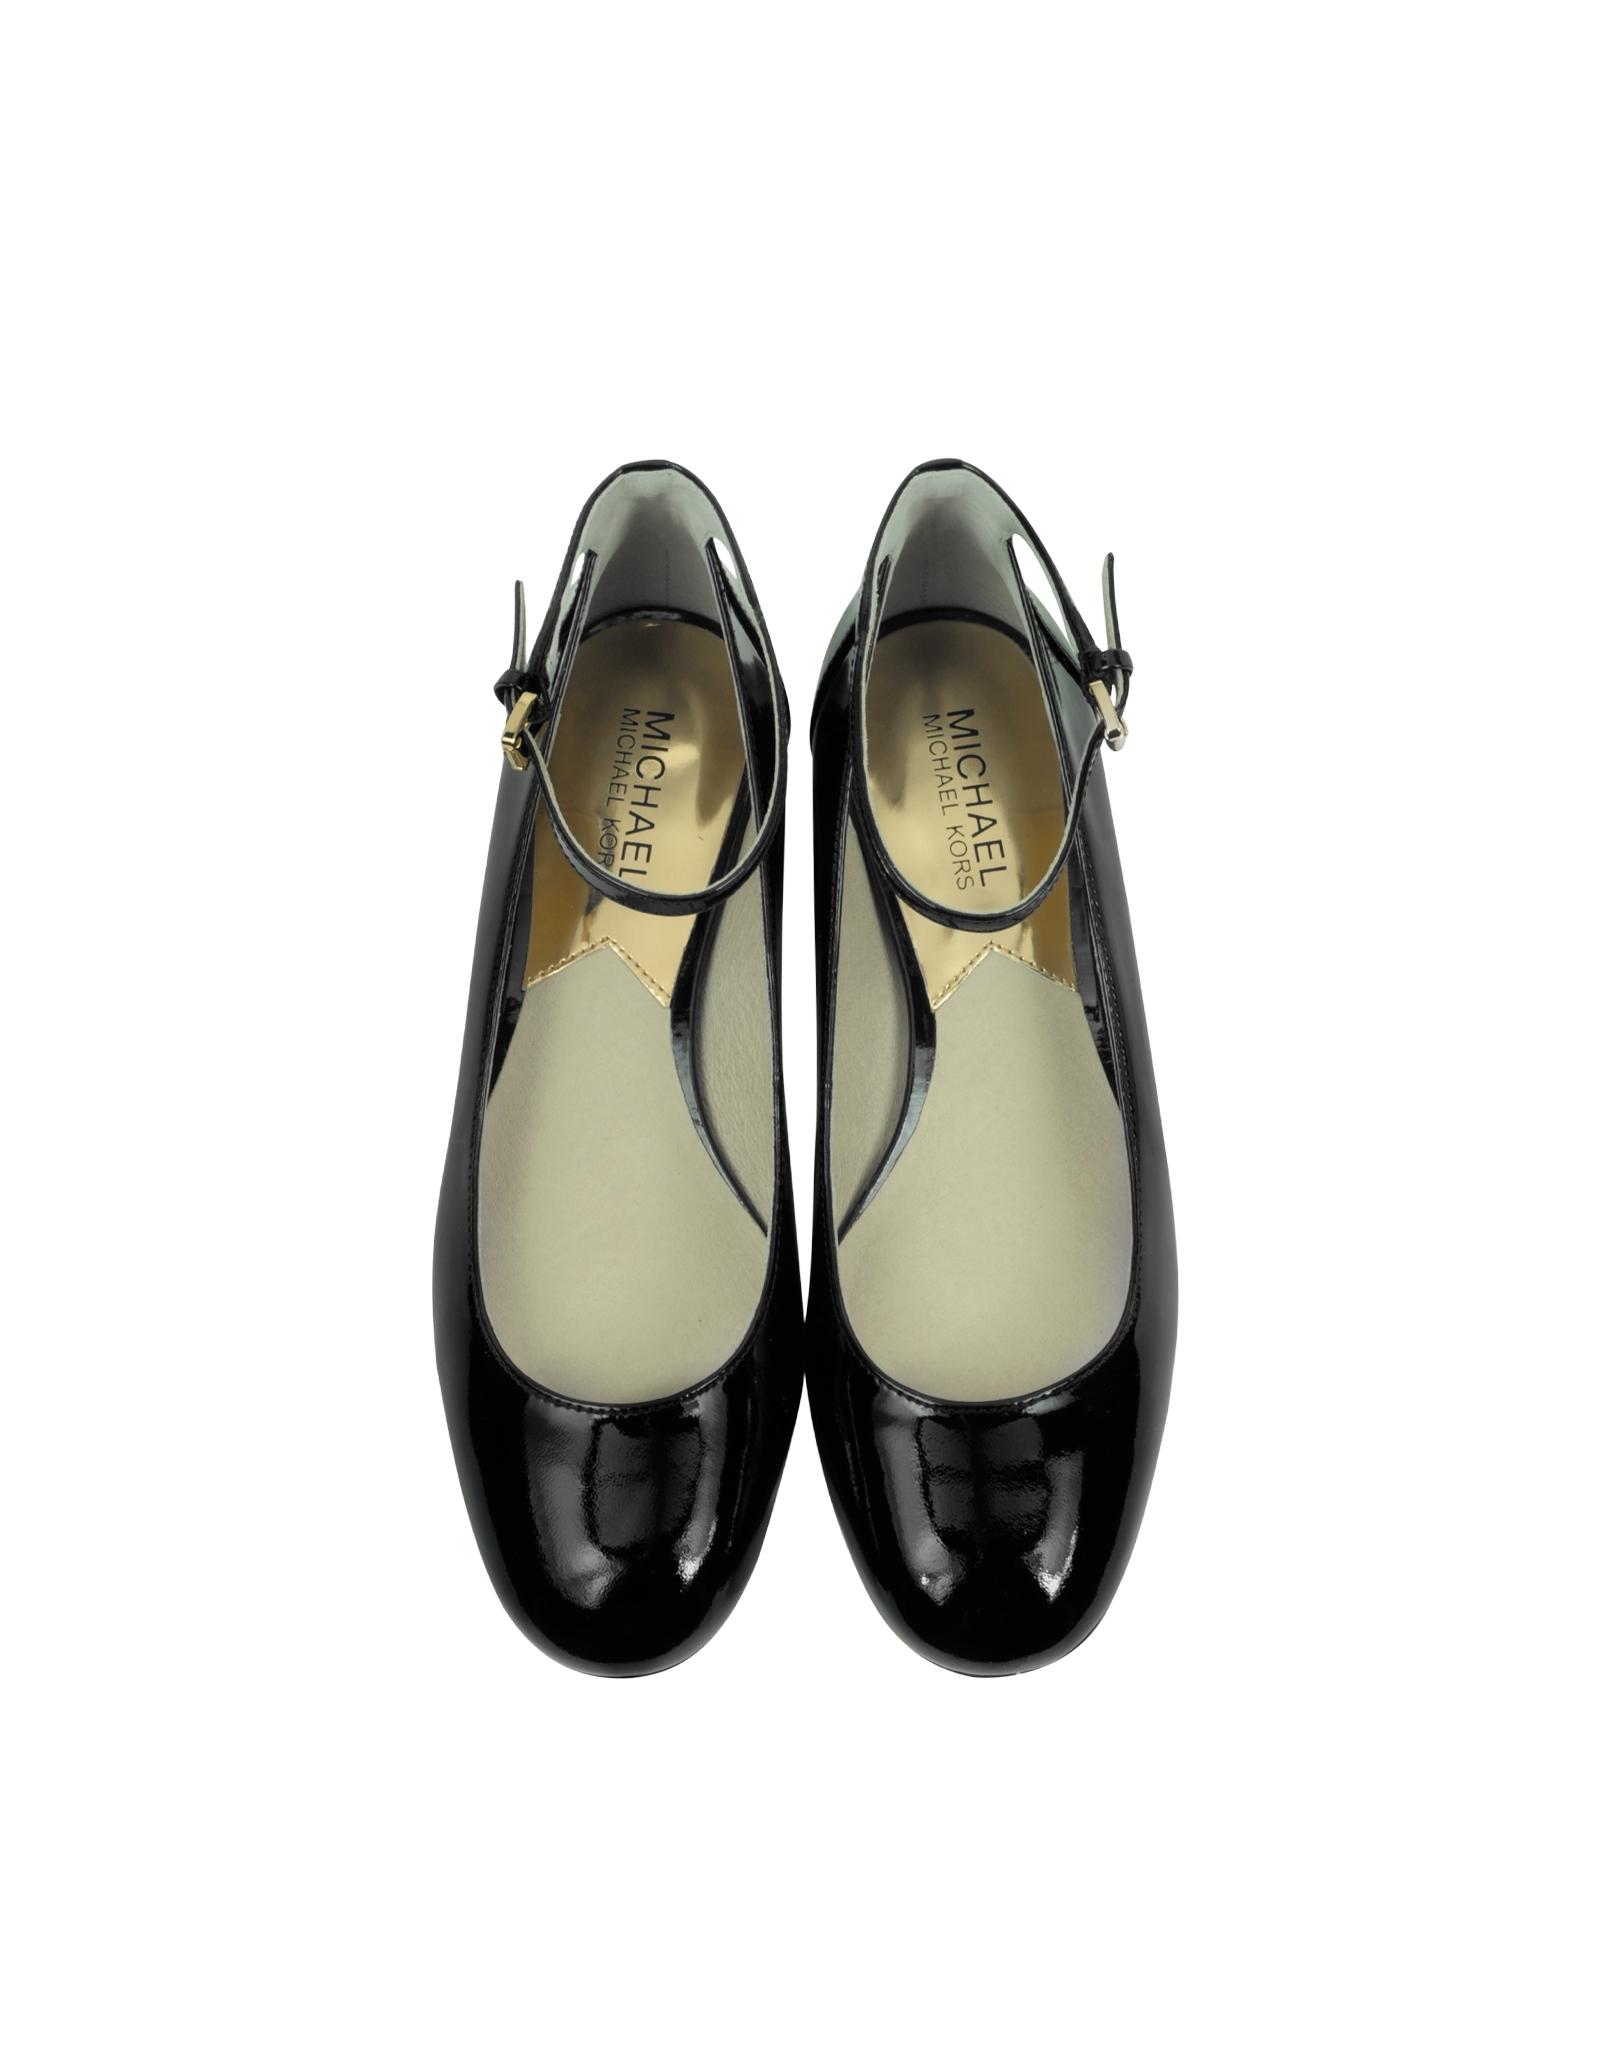 michael kors esther black patent leather ankle shoe